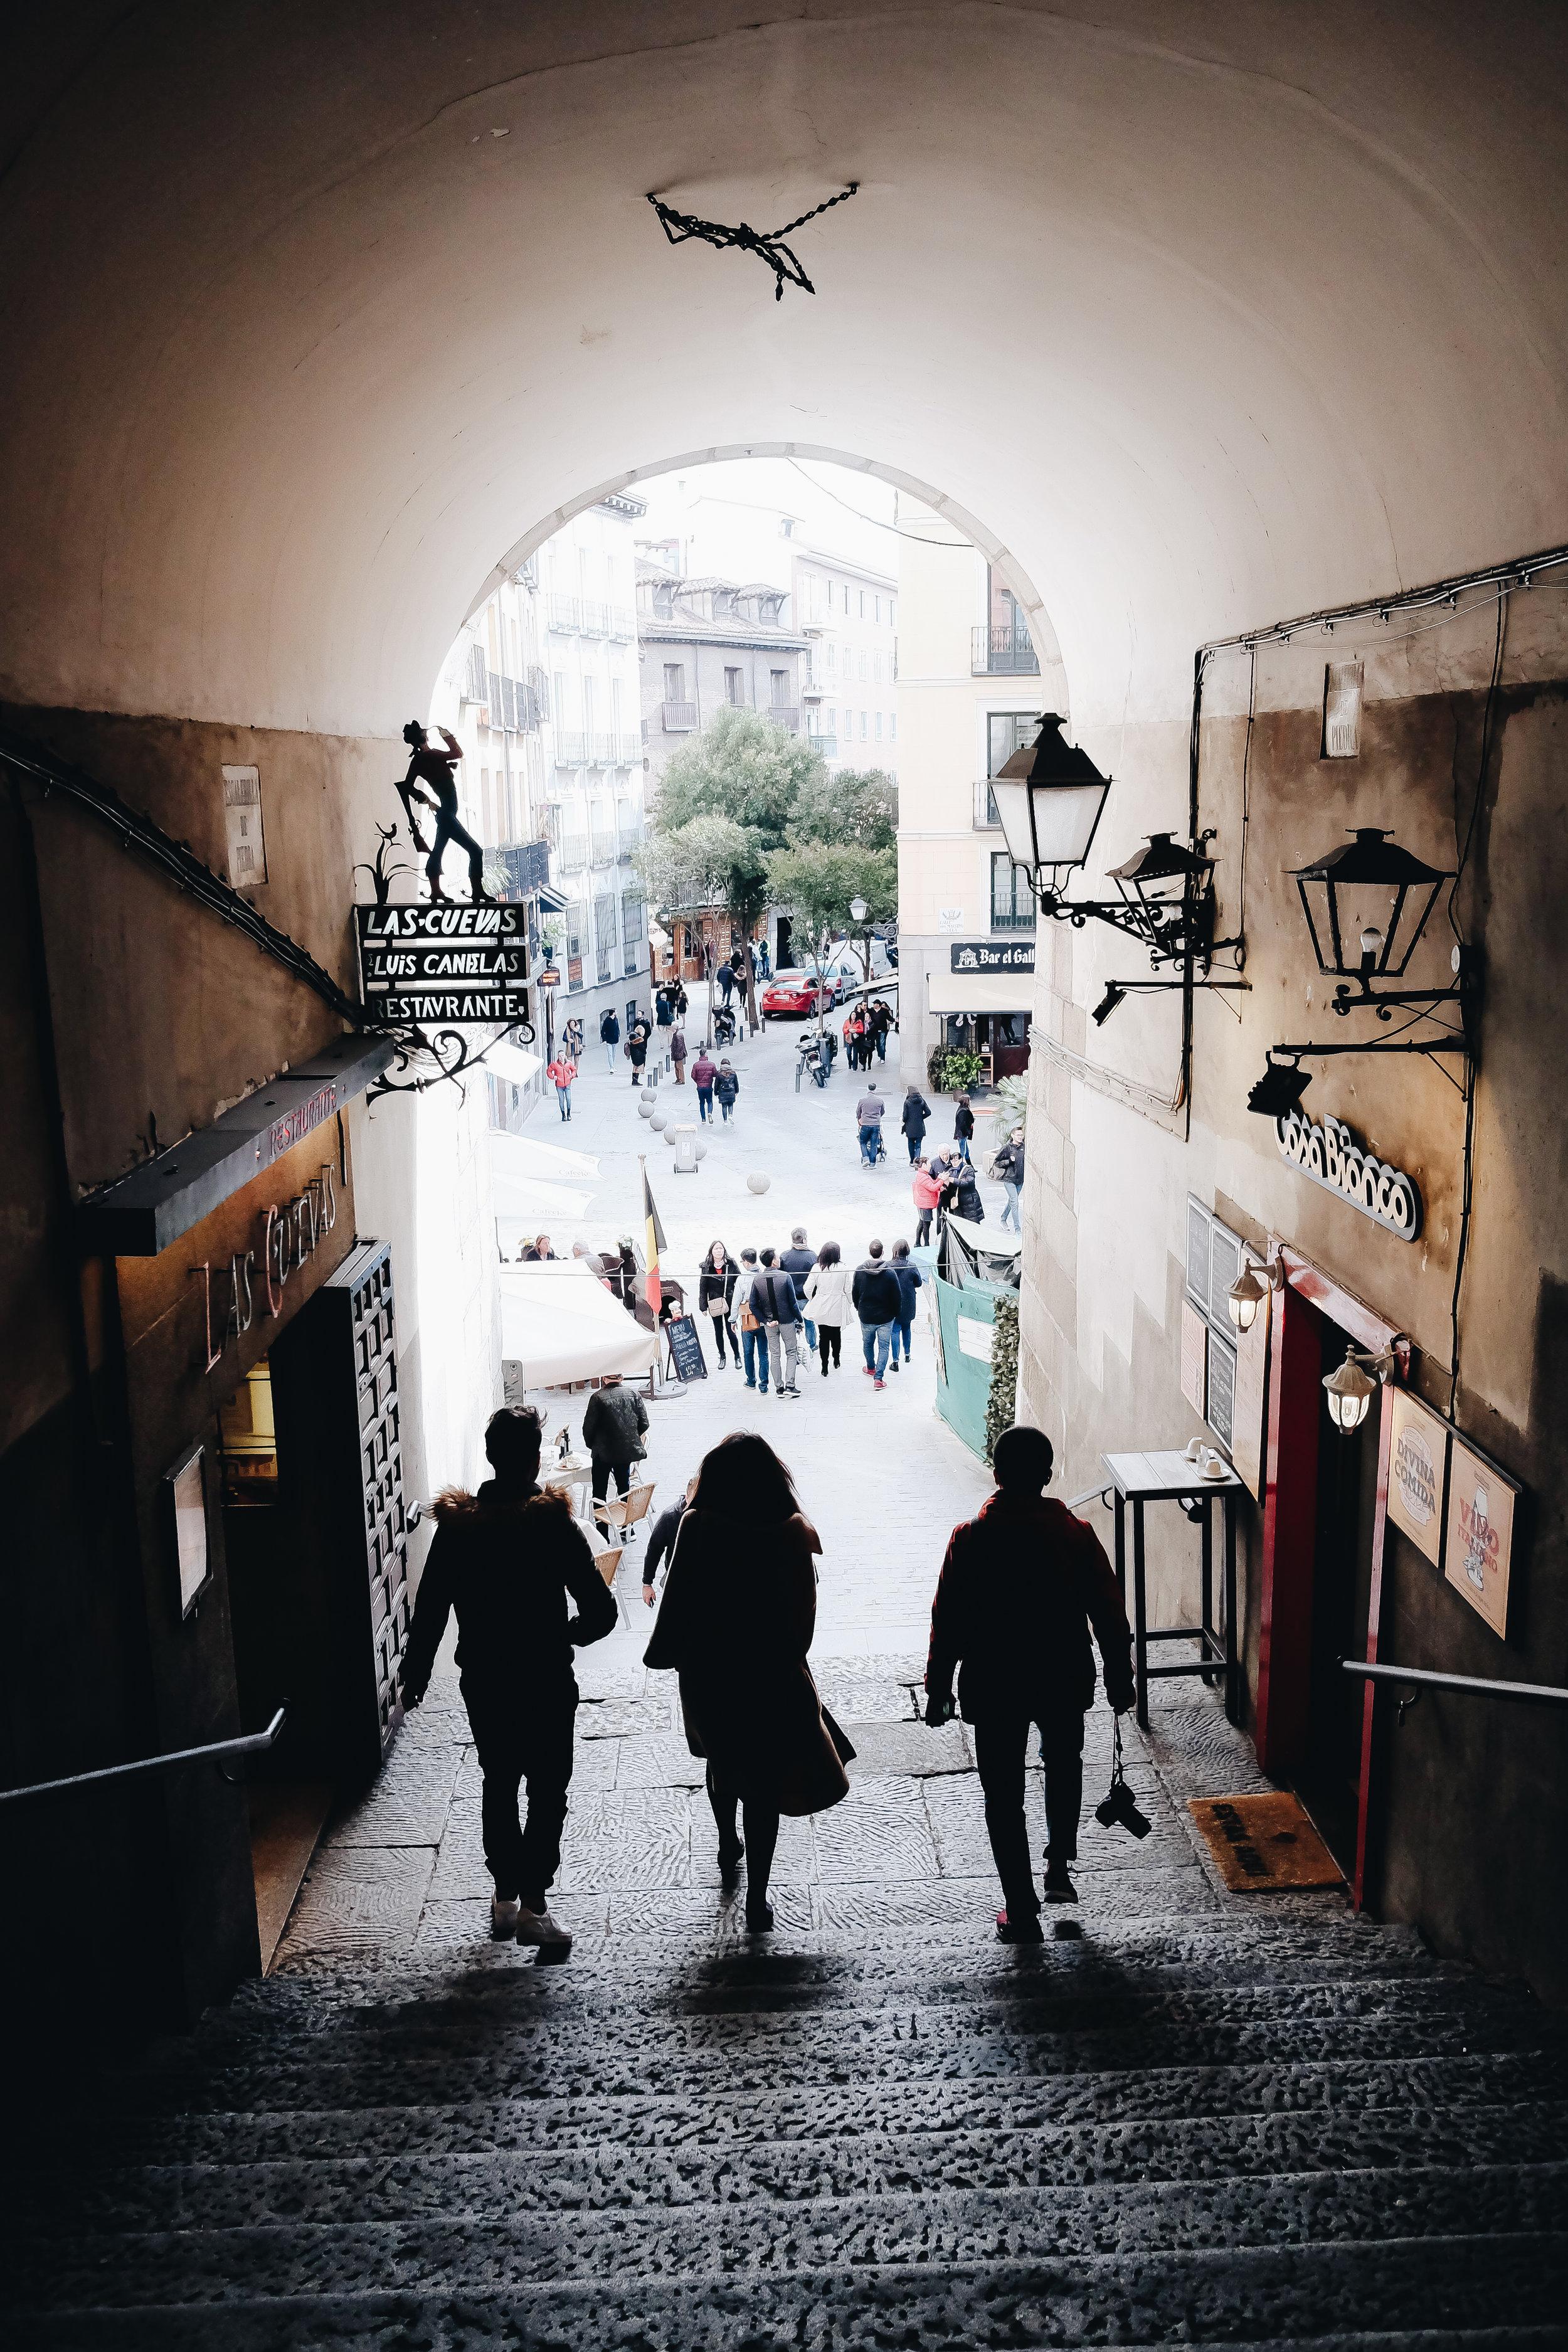 2. The City_11.jpg